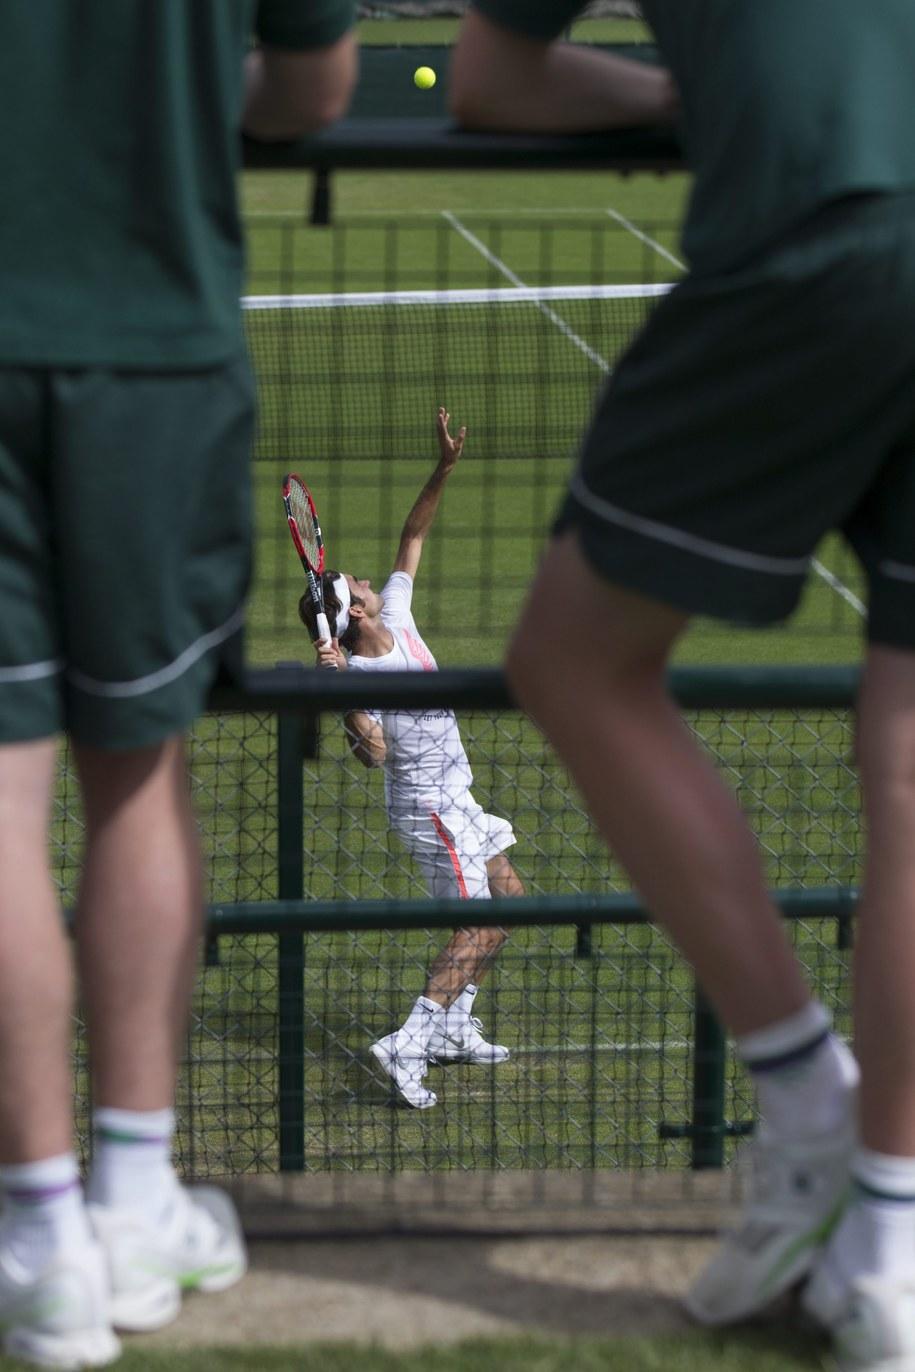 Roger Federer w czasie treningu na kortach Wimbledonu /PETER KLAUNZER /PAP/EPA